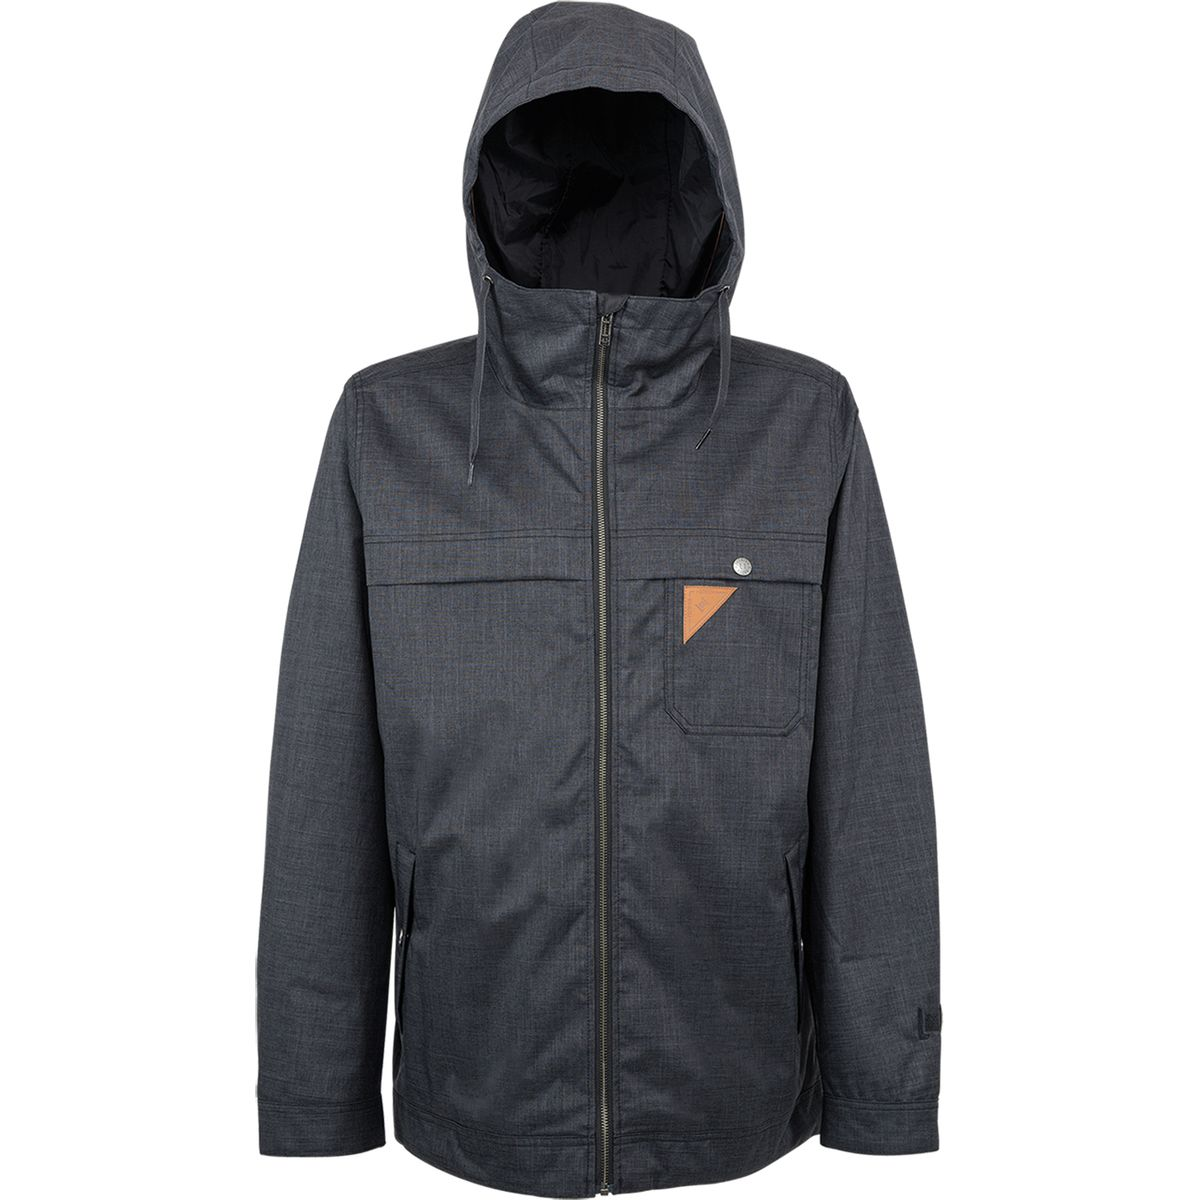 L1 Barstow Jacket - Men